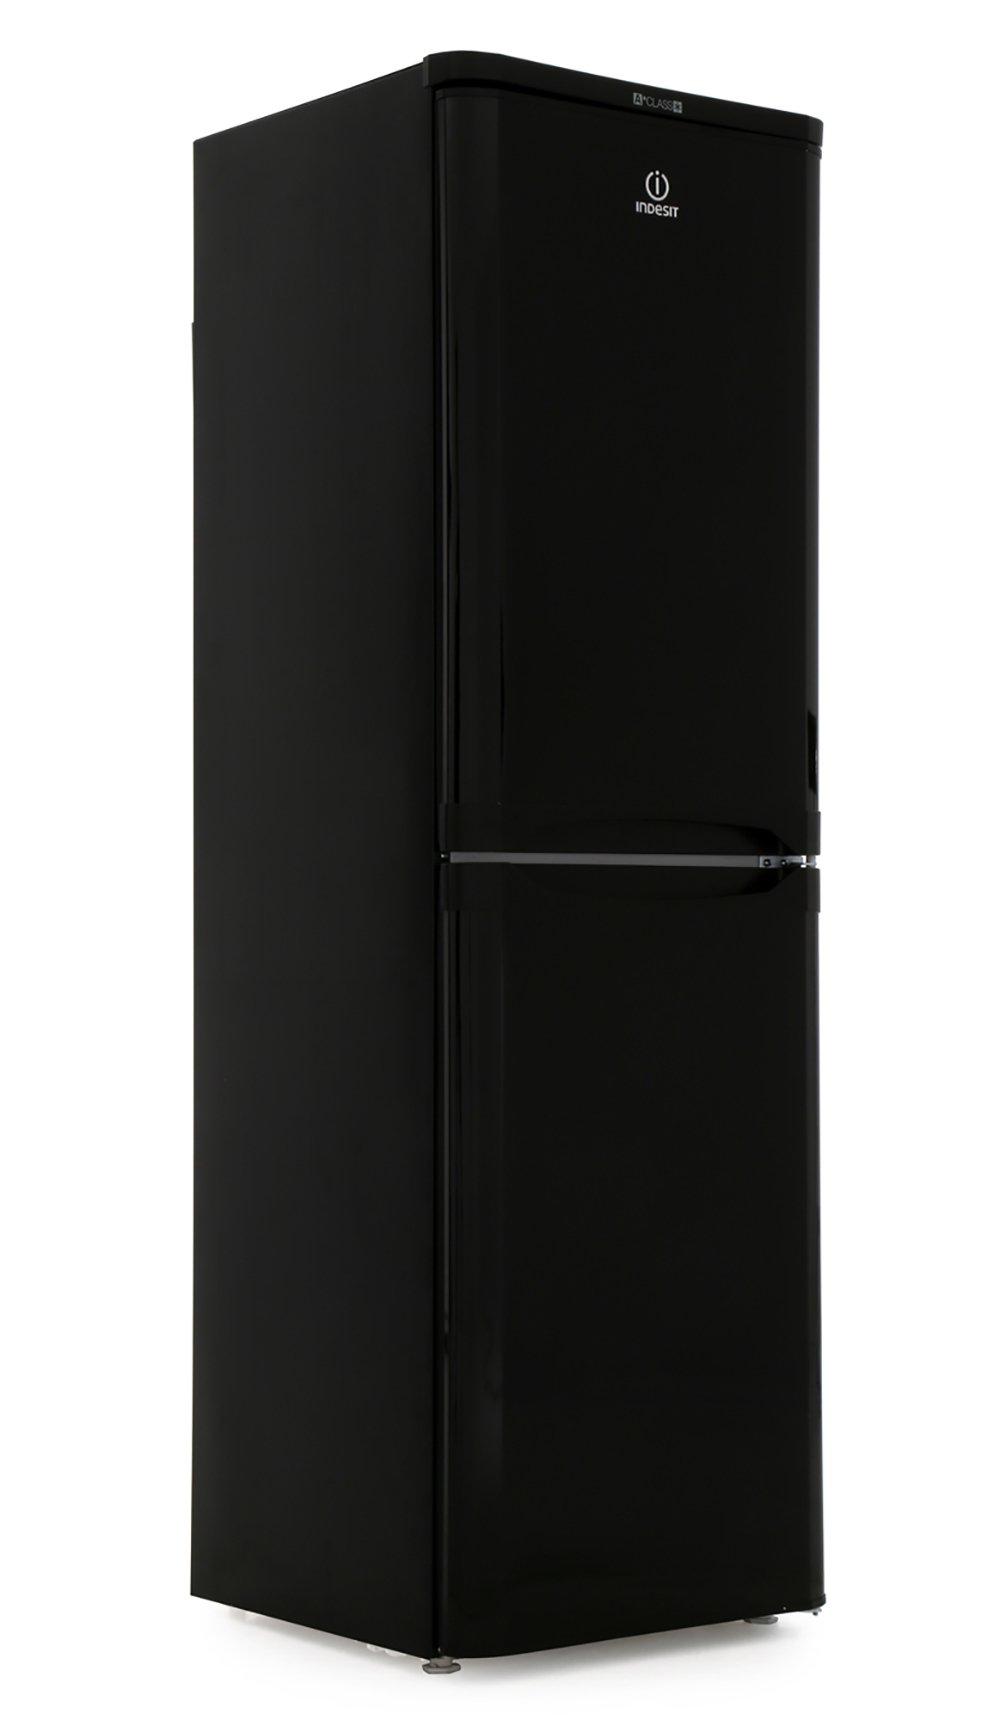 Indesit IBD 5517 B UK Low Frost Fridge Freezer